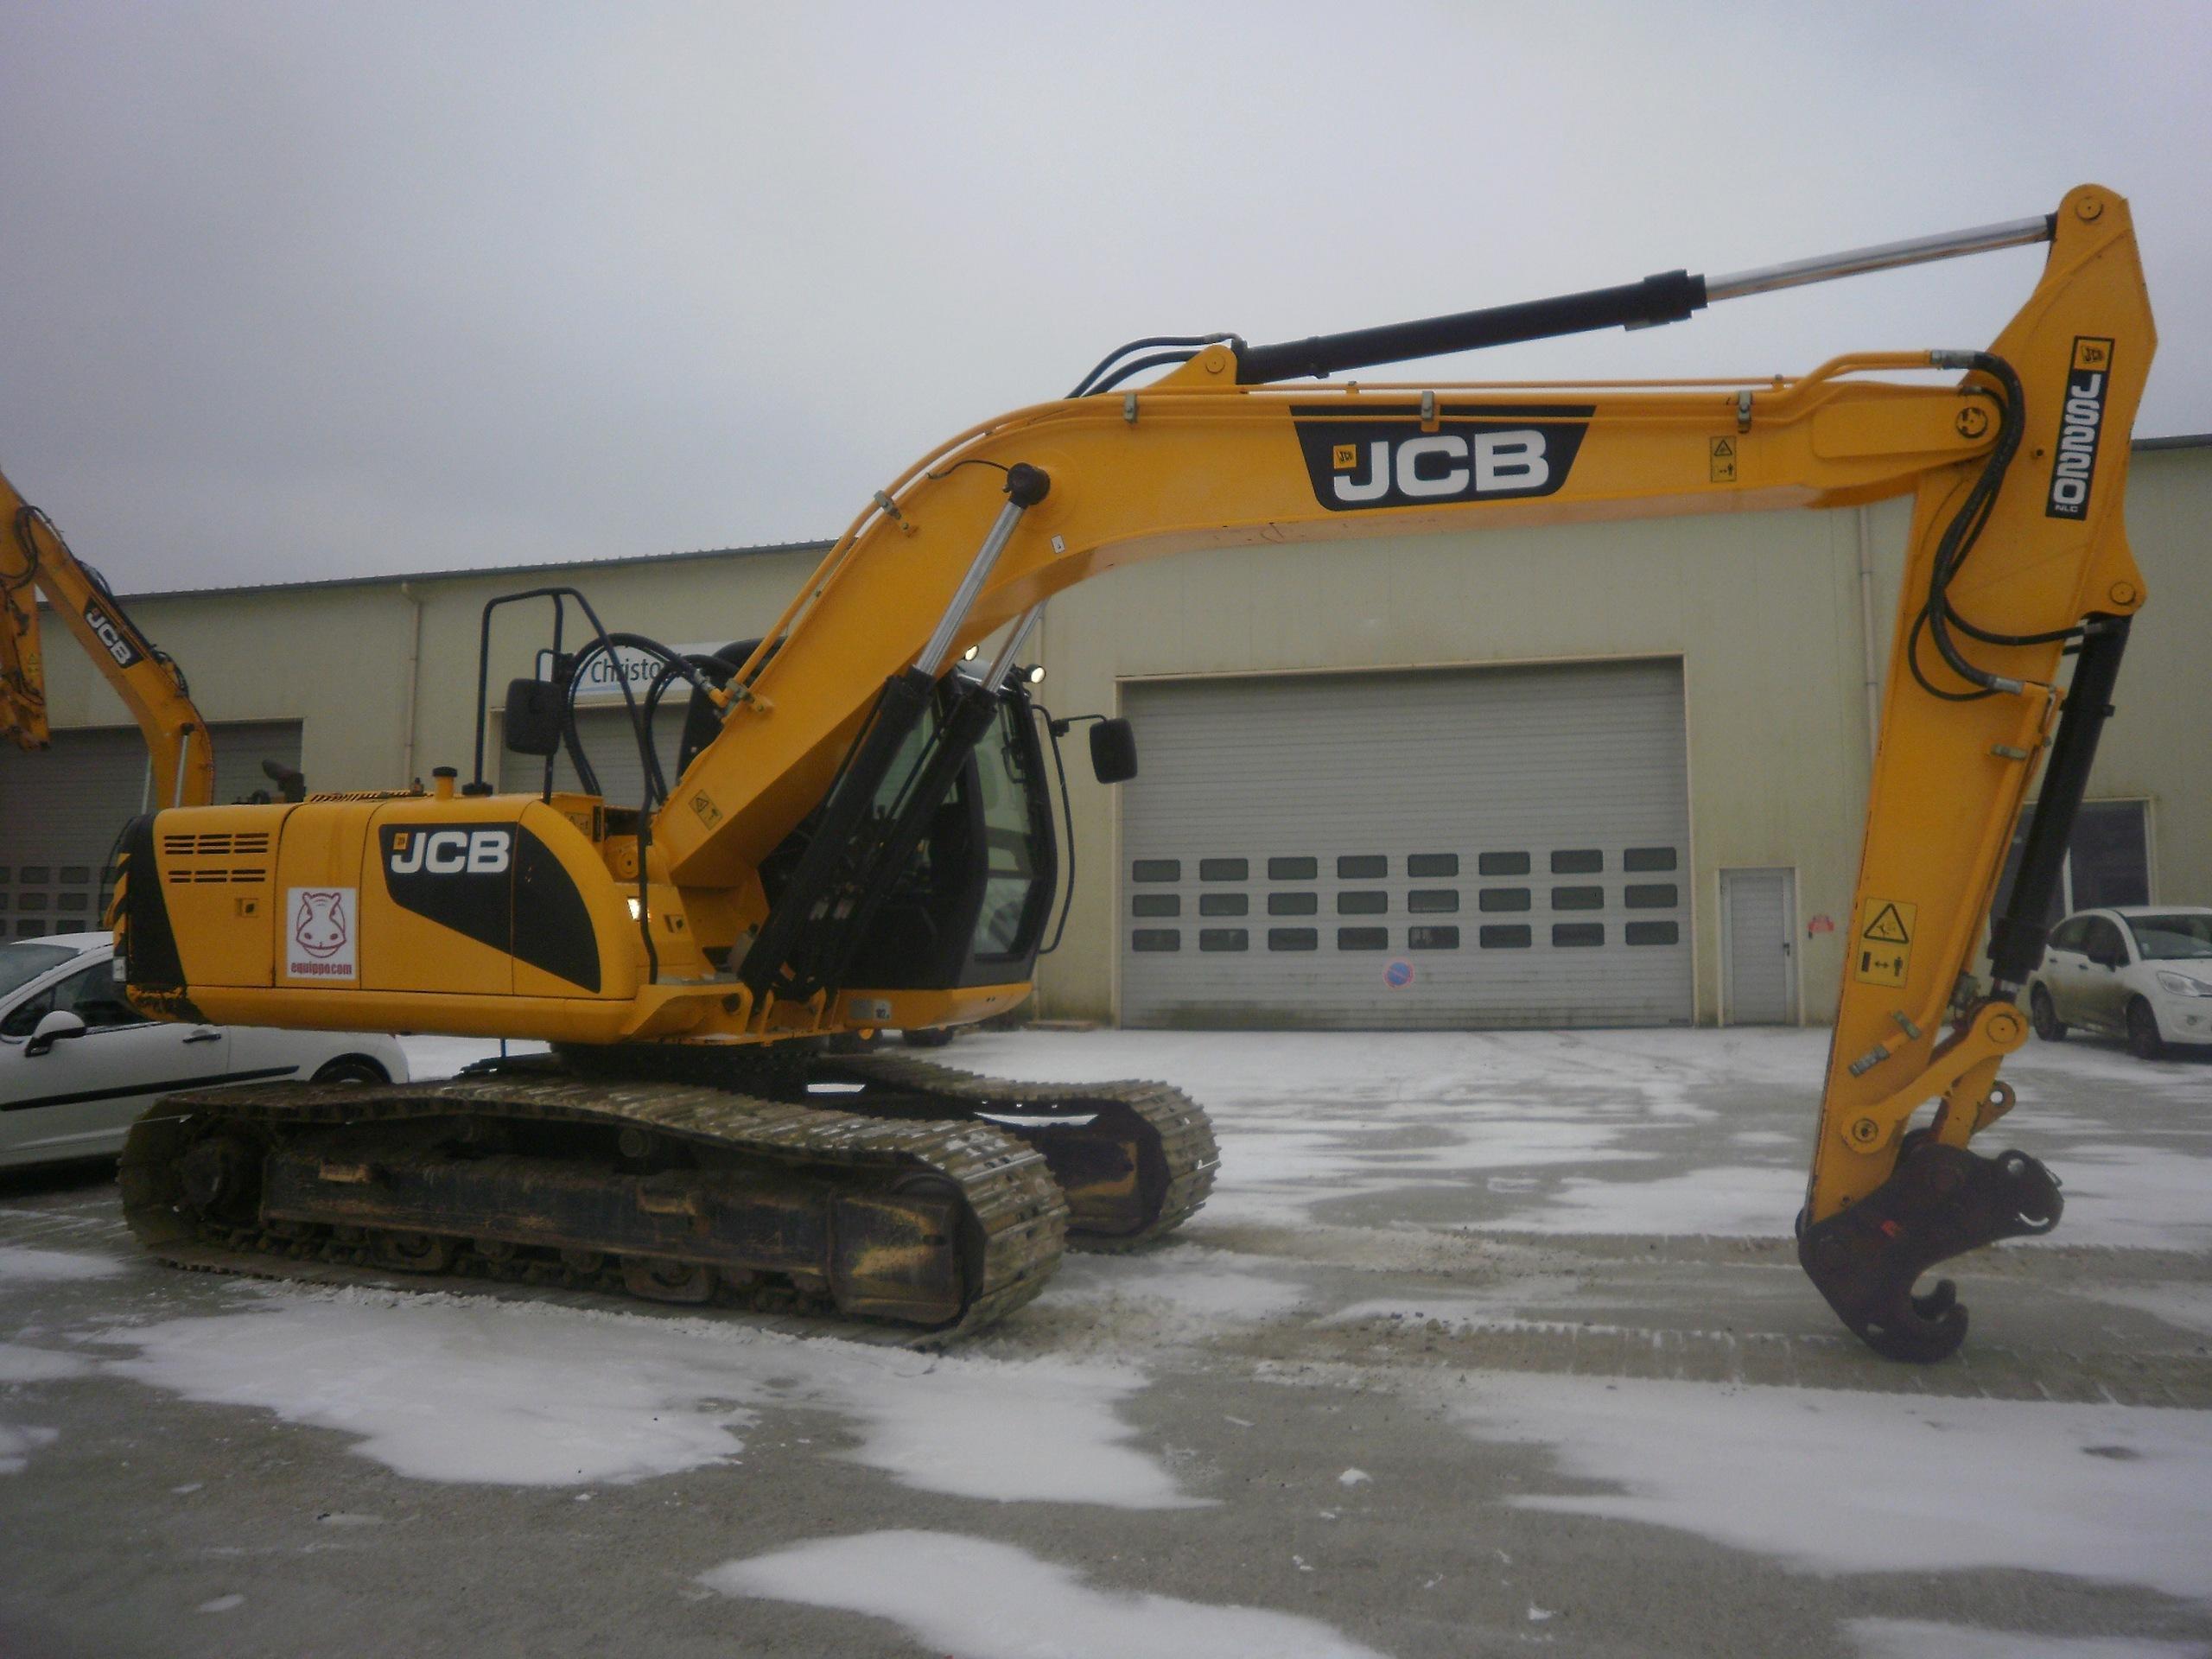 2012 - JCB JS220NLC